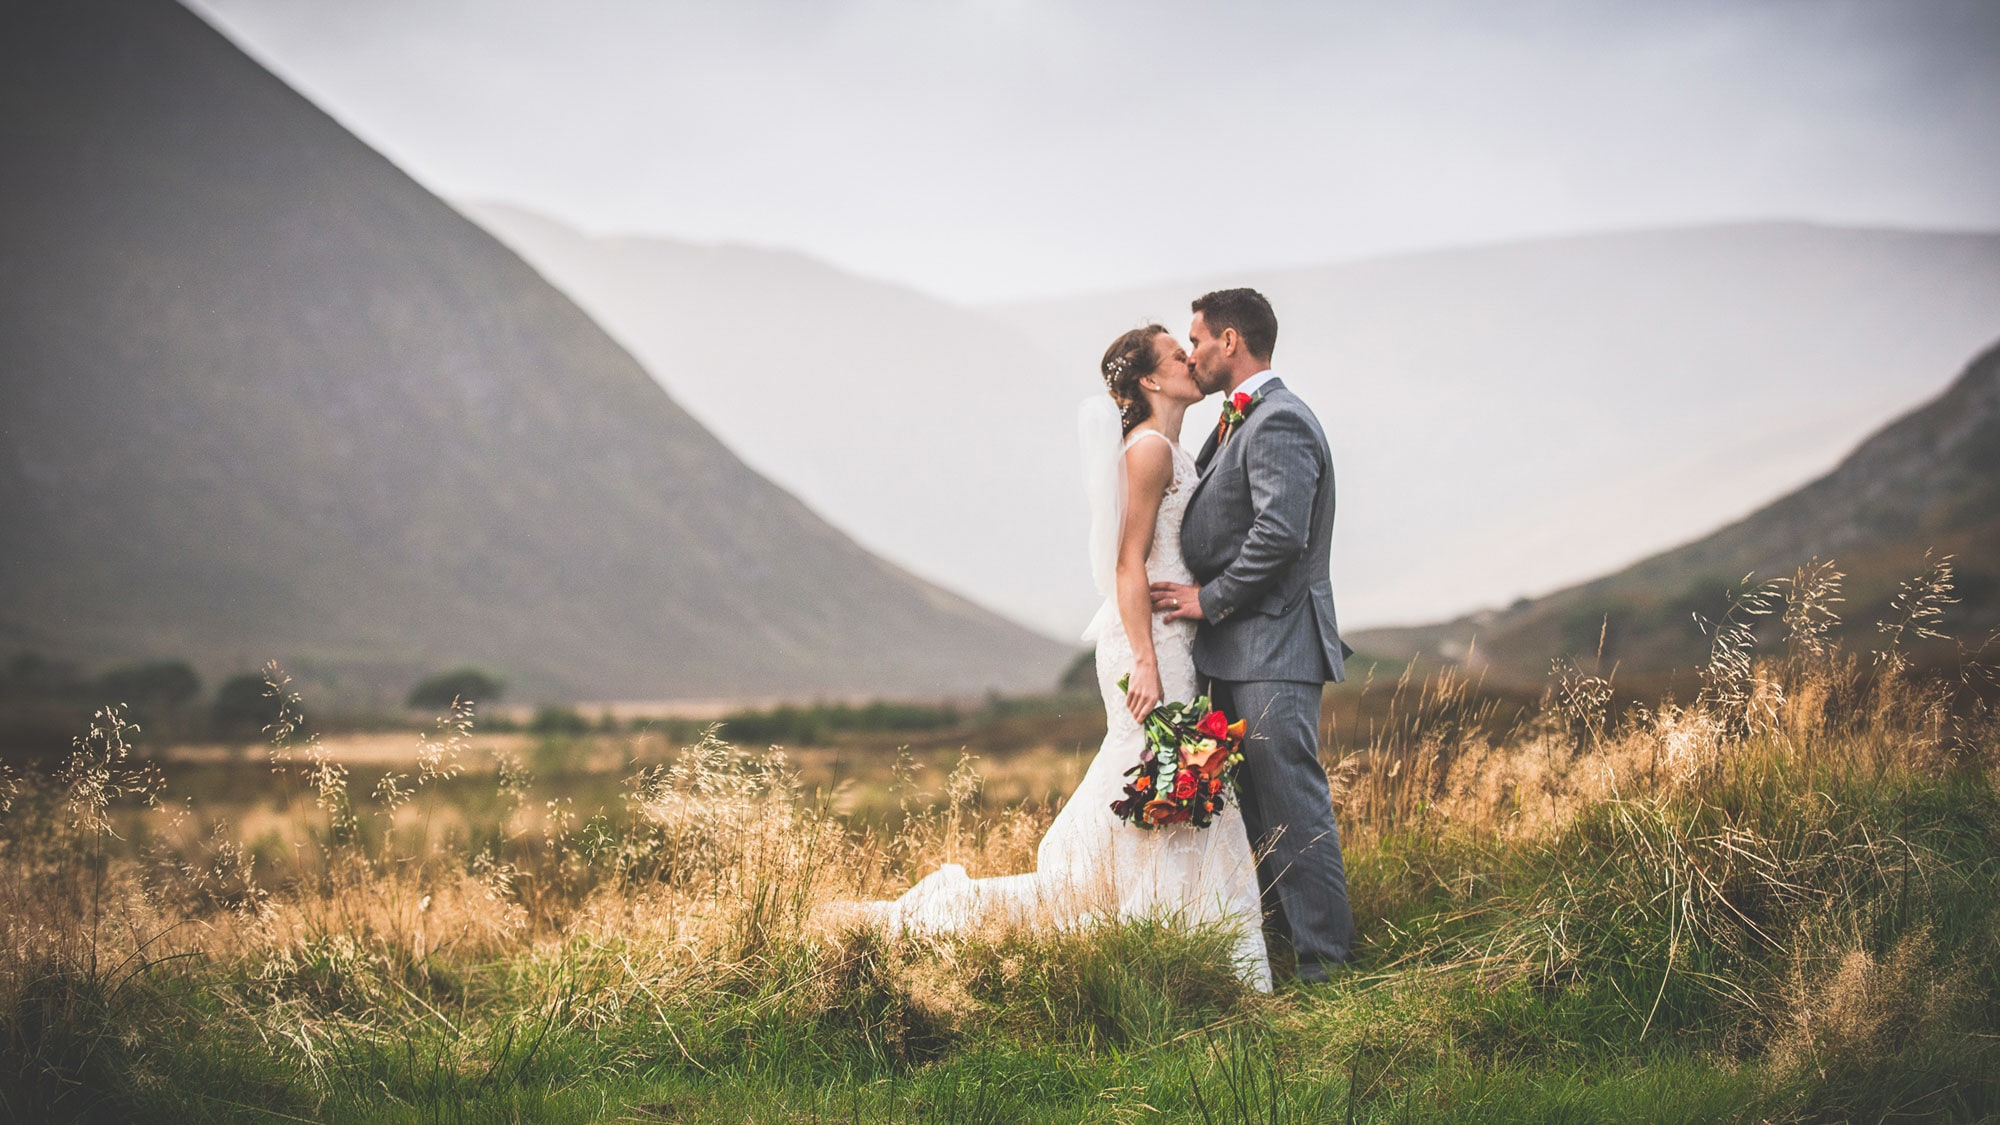 Wedding Photographer Inverness